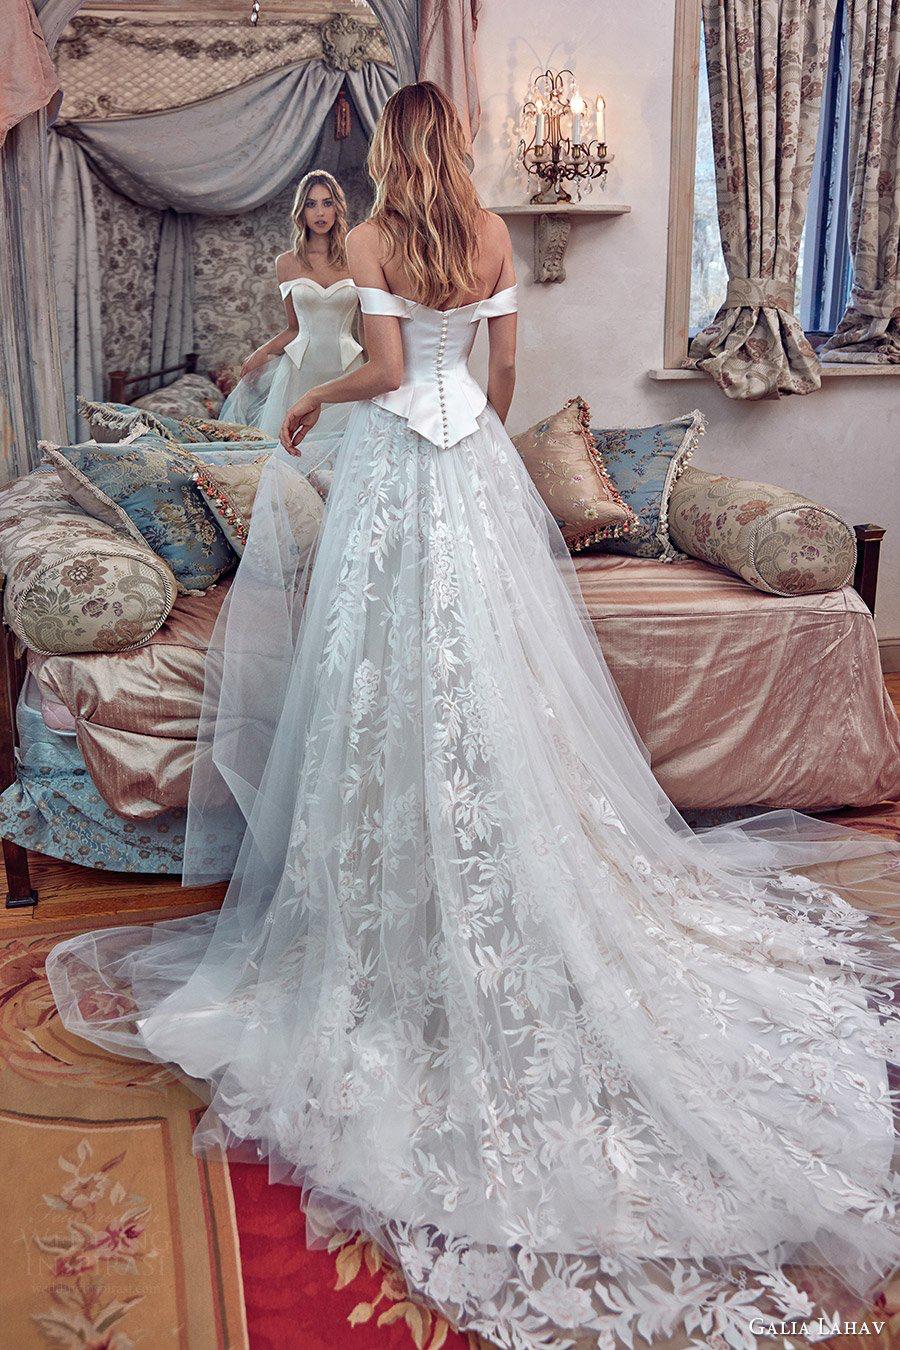 Celtic wedding dress  Pin by Diane on Wedding  Pinterest  Wedding dresses Wedding and